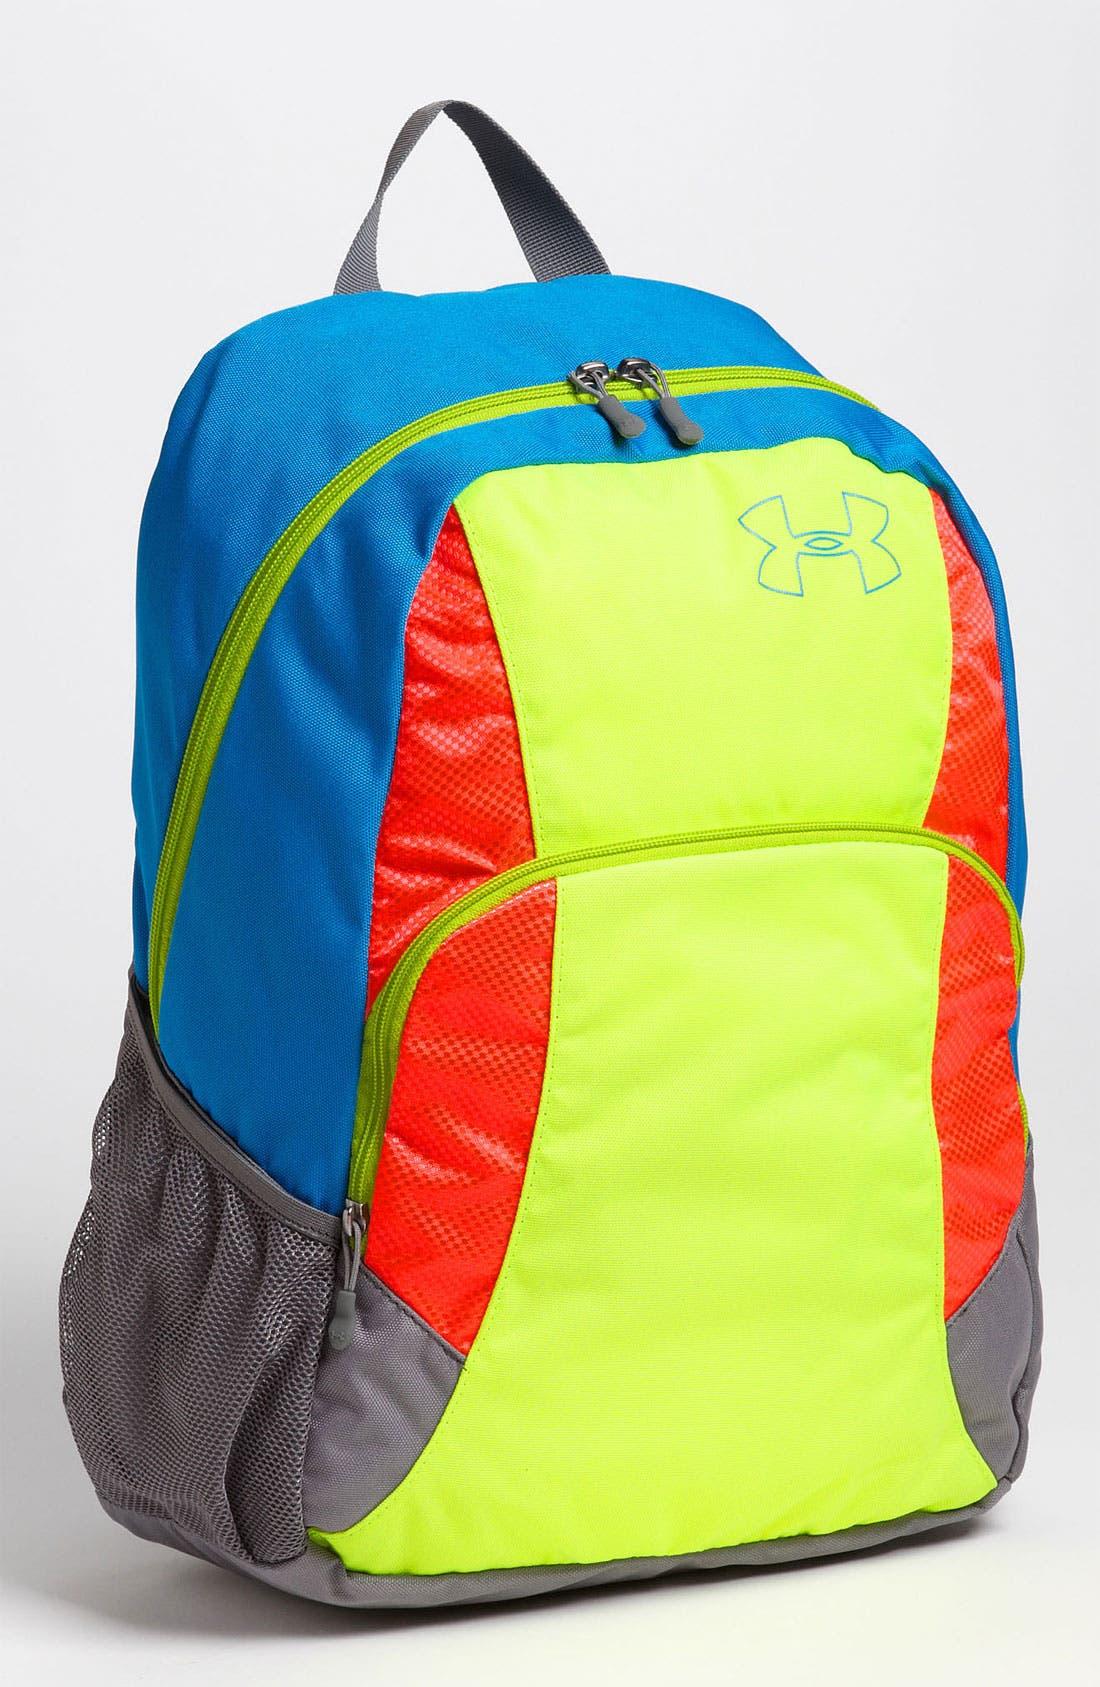 Alternate Image 1 Selected - Under Armour 'Rambler' Backpack (Kids)